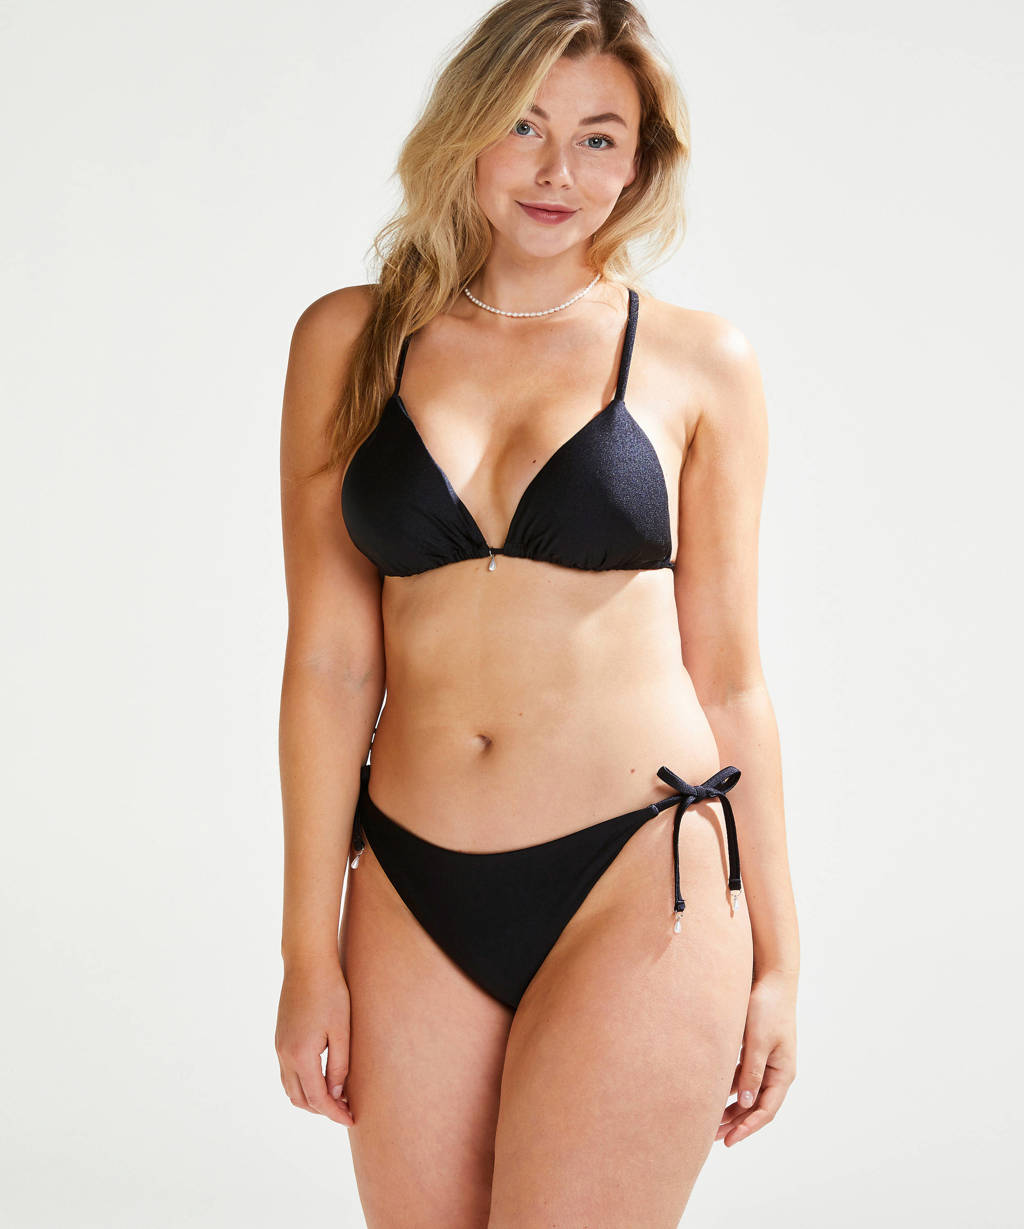 Hunkemöller bikinibroekje Cannes by Vivian Hoorn zwart, Zwart